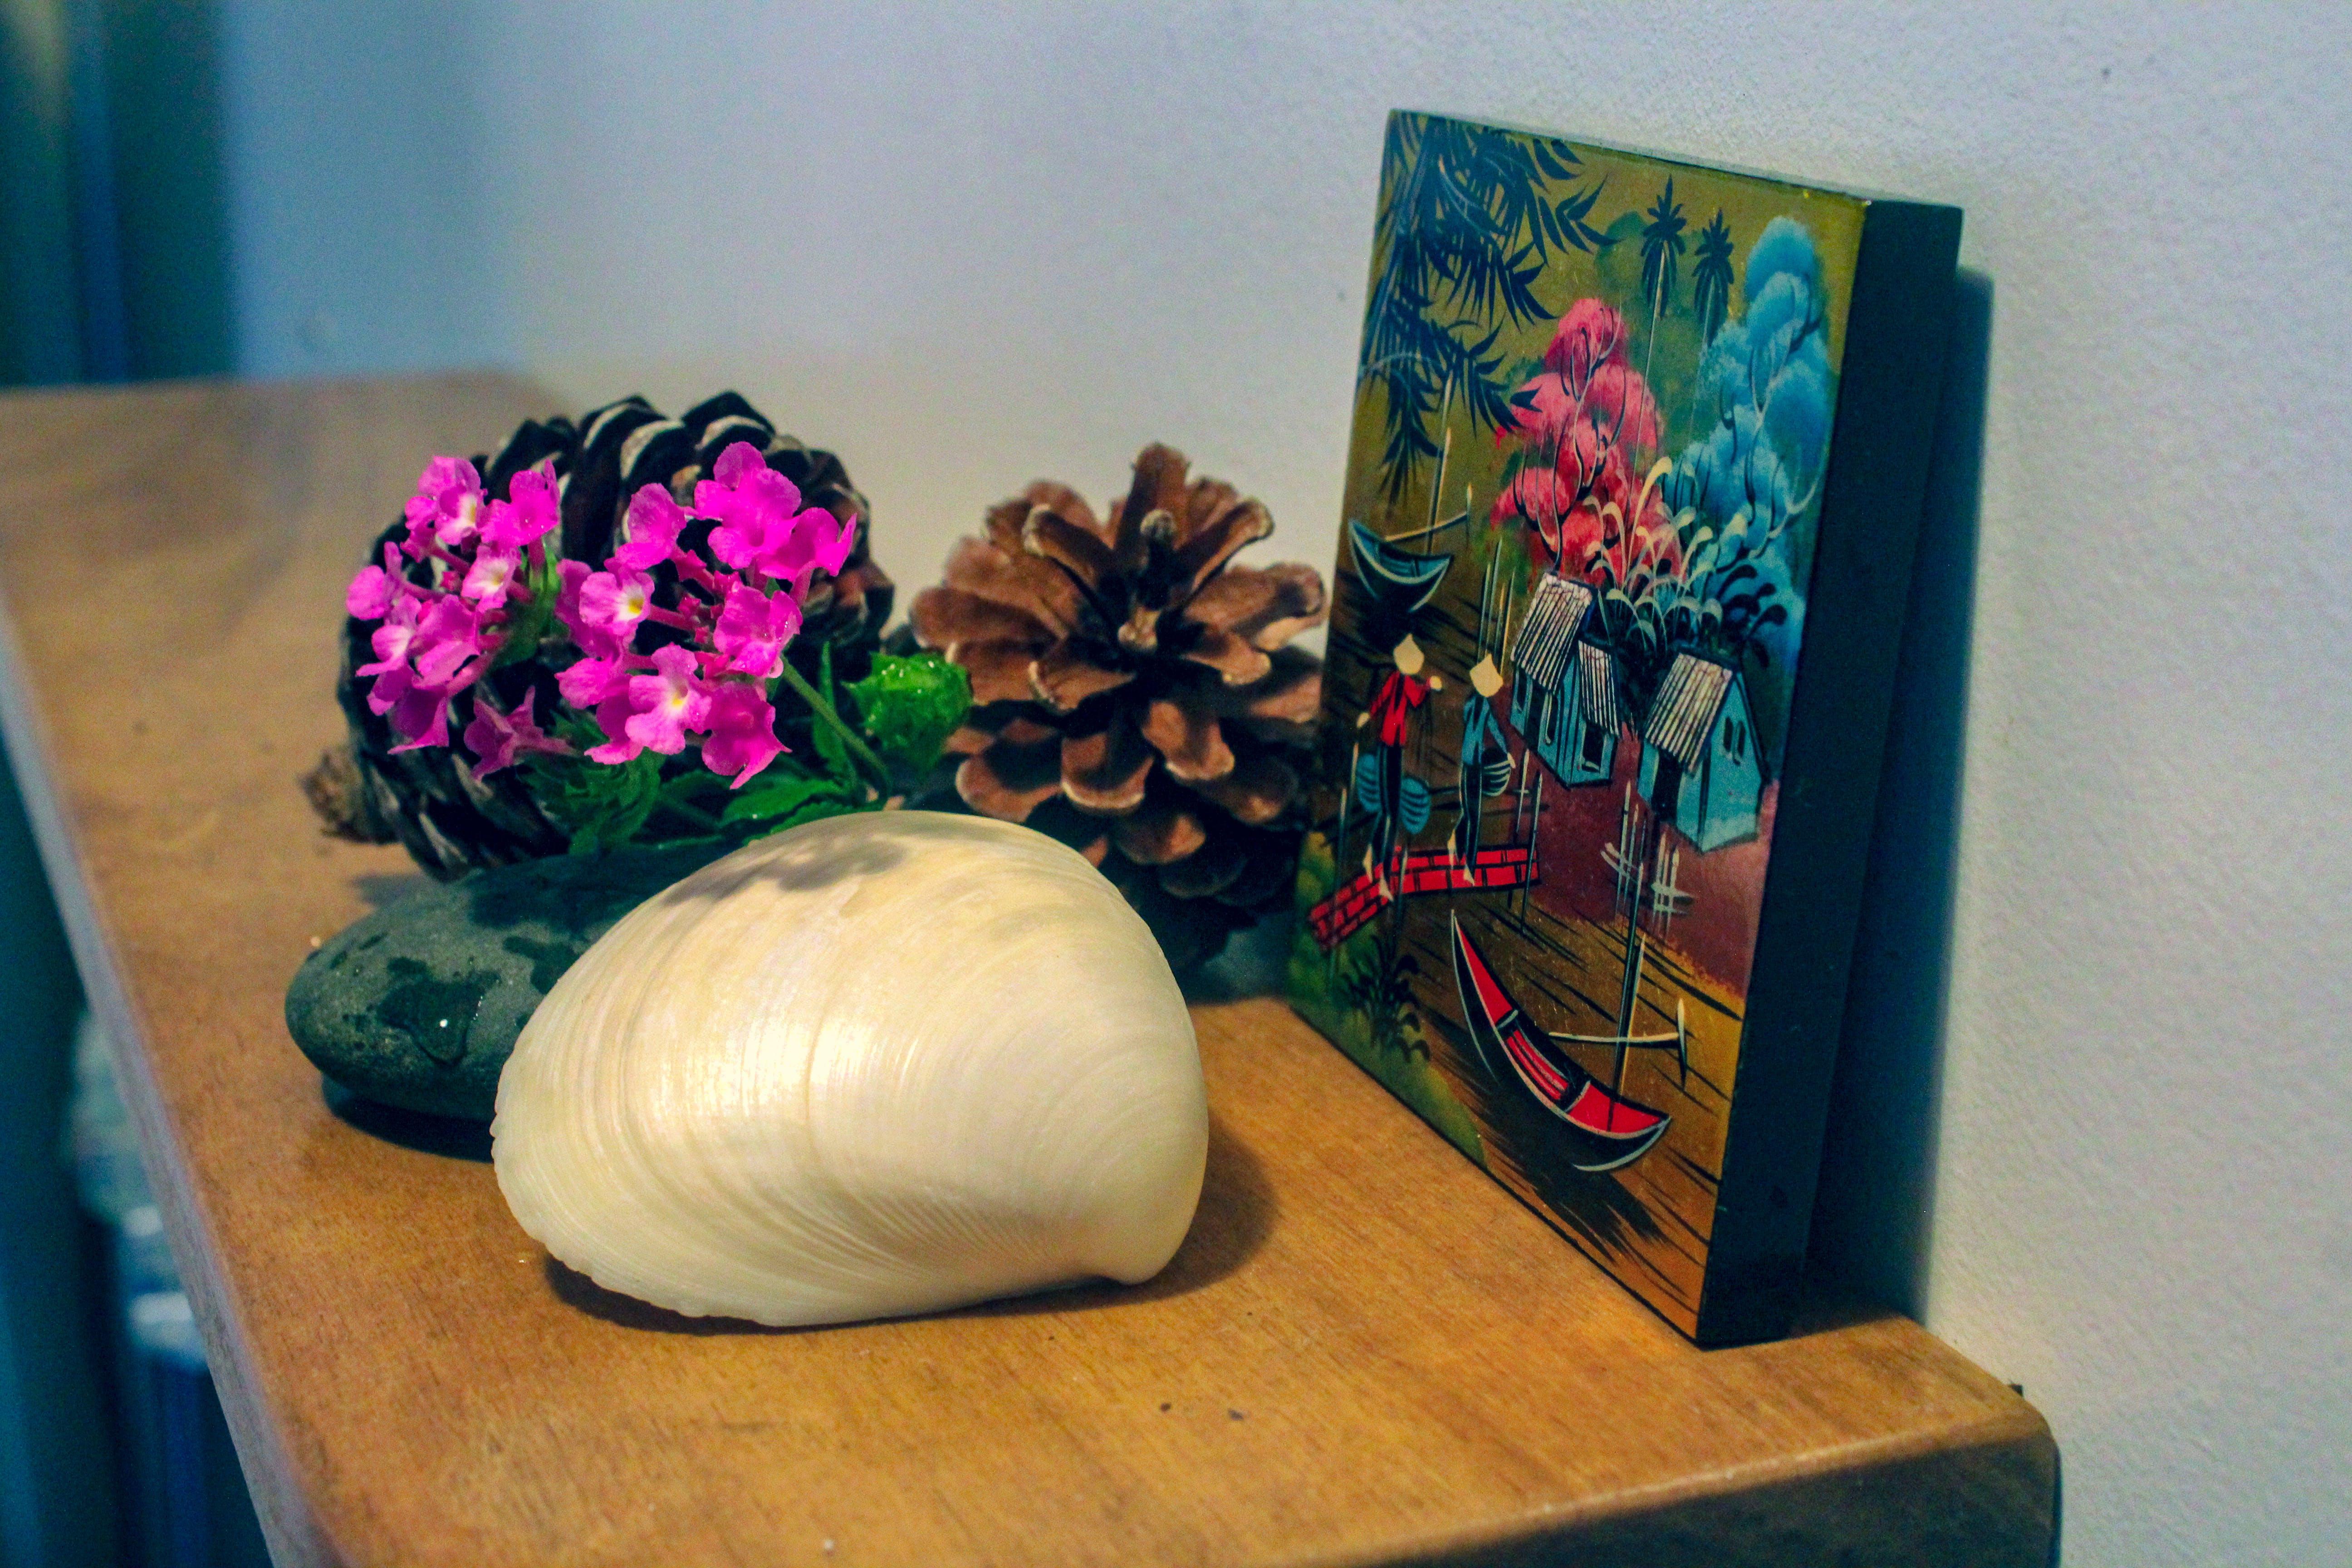 Free stock photo of #flowersonshelf